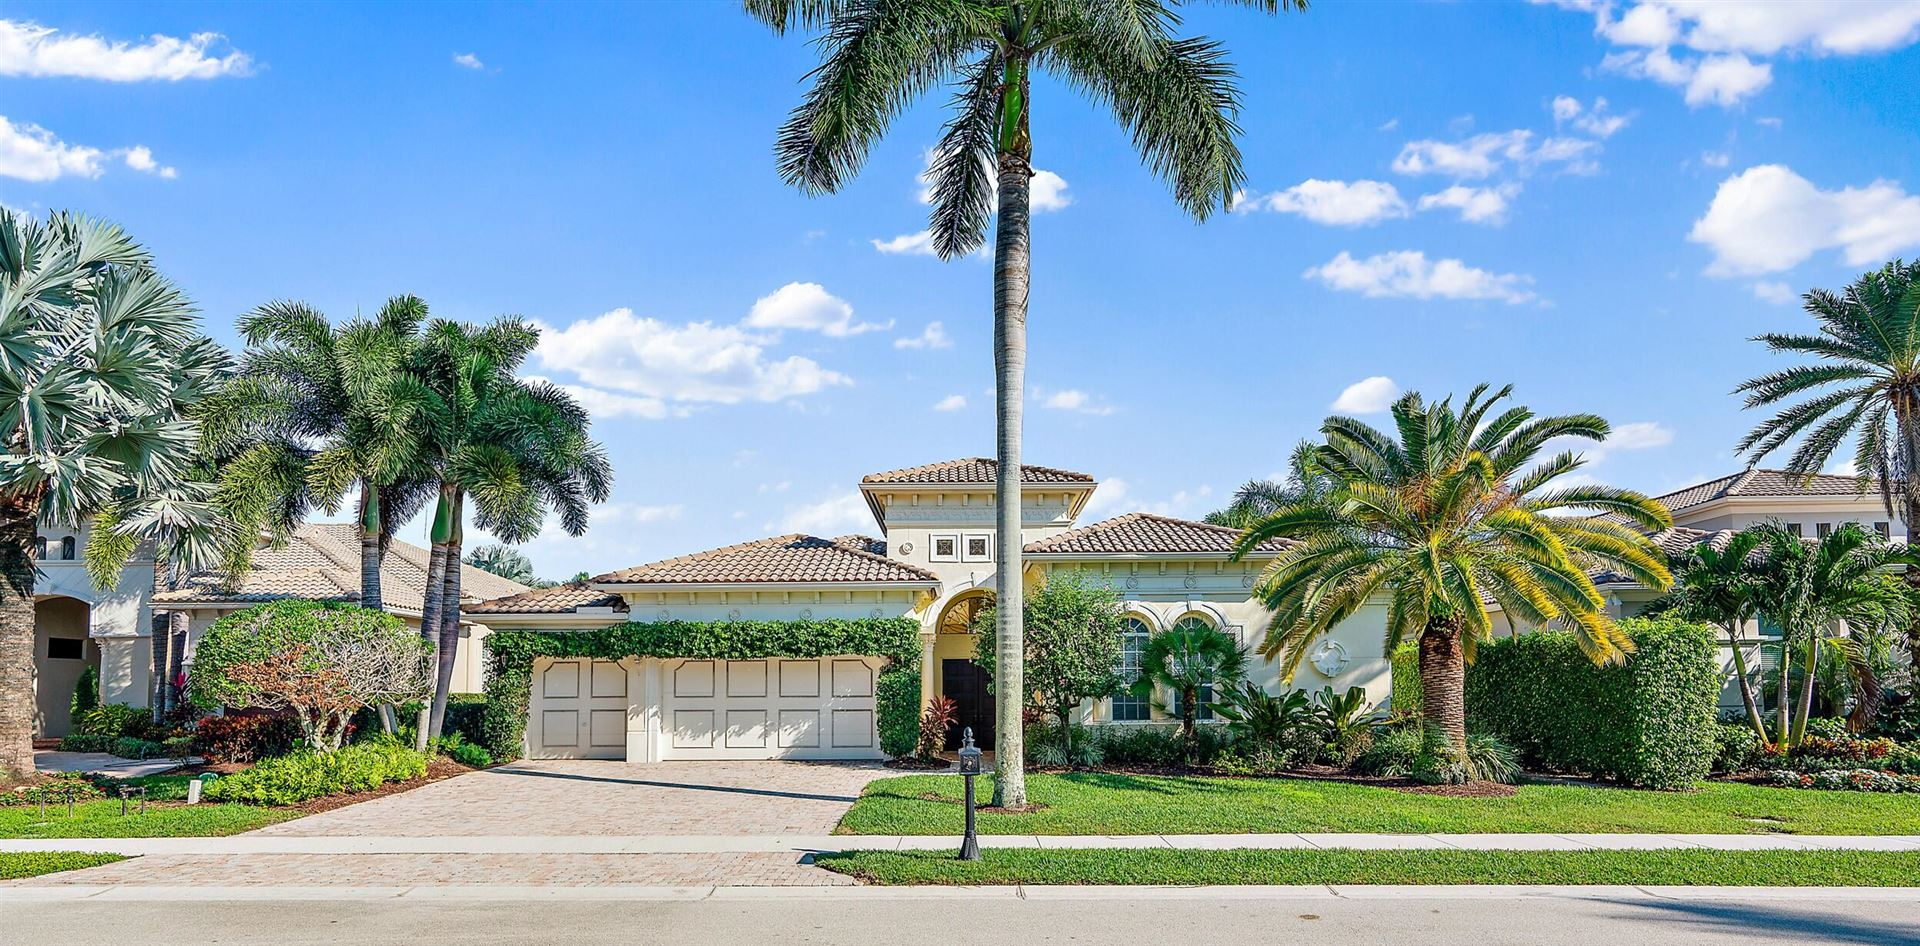 Photo of 414 Savoie Drive, Palm Beach Gardens, FL 33410 (MLS # RX-10707800)